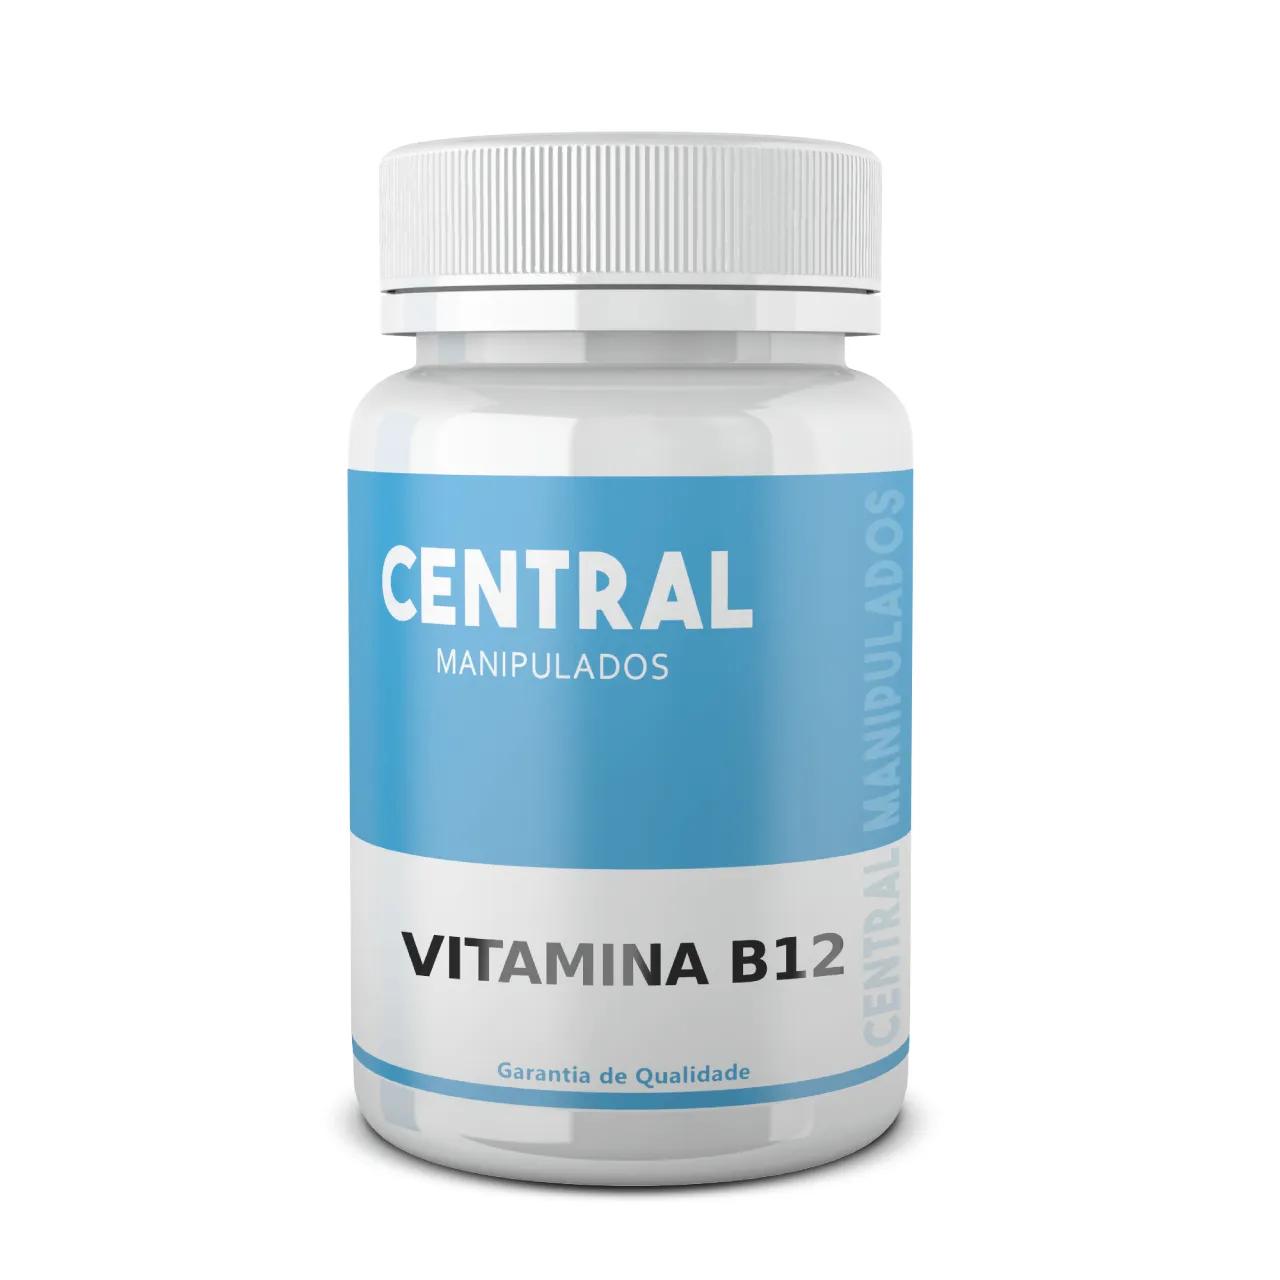 Vitamina B12 5mg - 120 Comprimidos Sublingual  (Tapiocaps)